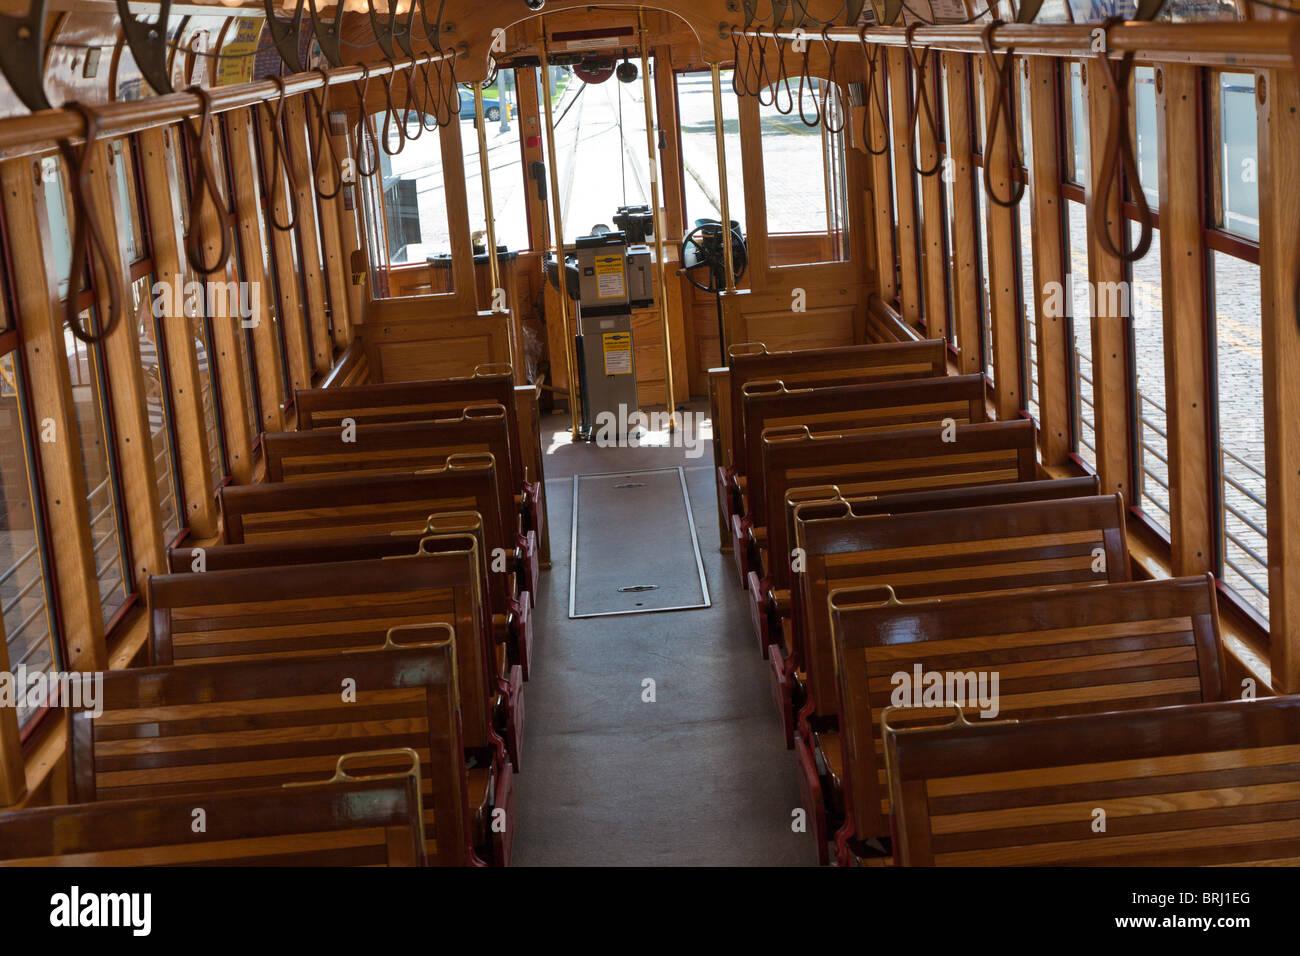 Ybor City, FL - July 2009 - Interior of a TECO Line streetcar in Ybor City area of Tampa, Florida - Stock Image